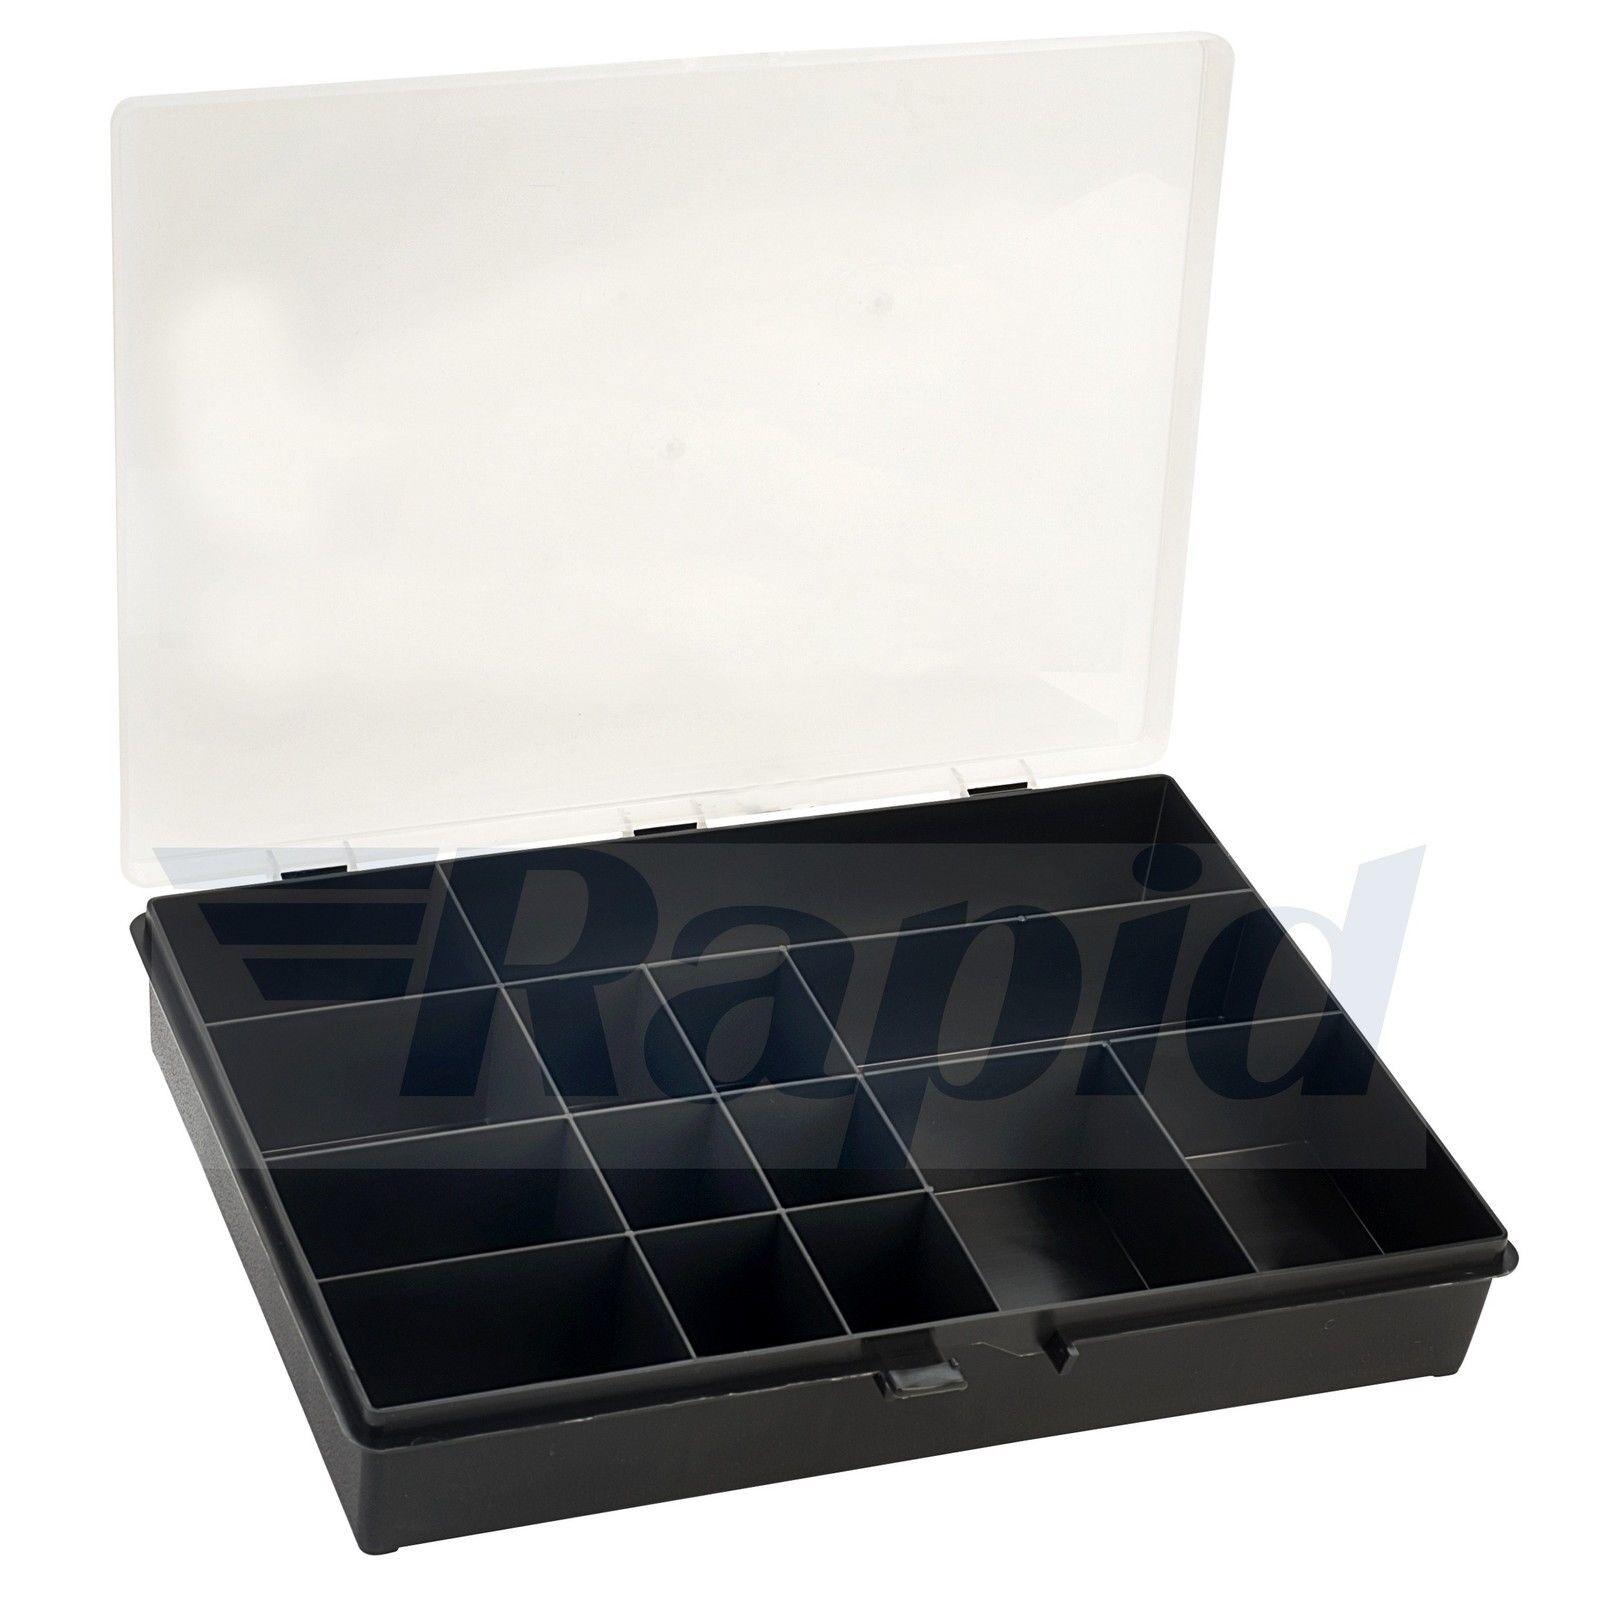 Raaco A4 Profi service Case Assorter 32 fixe compartiments RAA136181